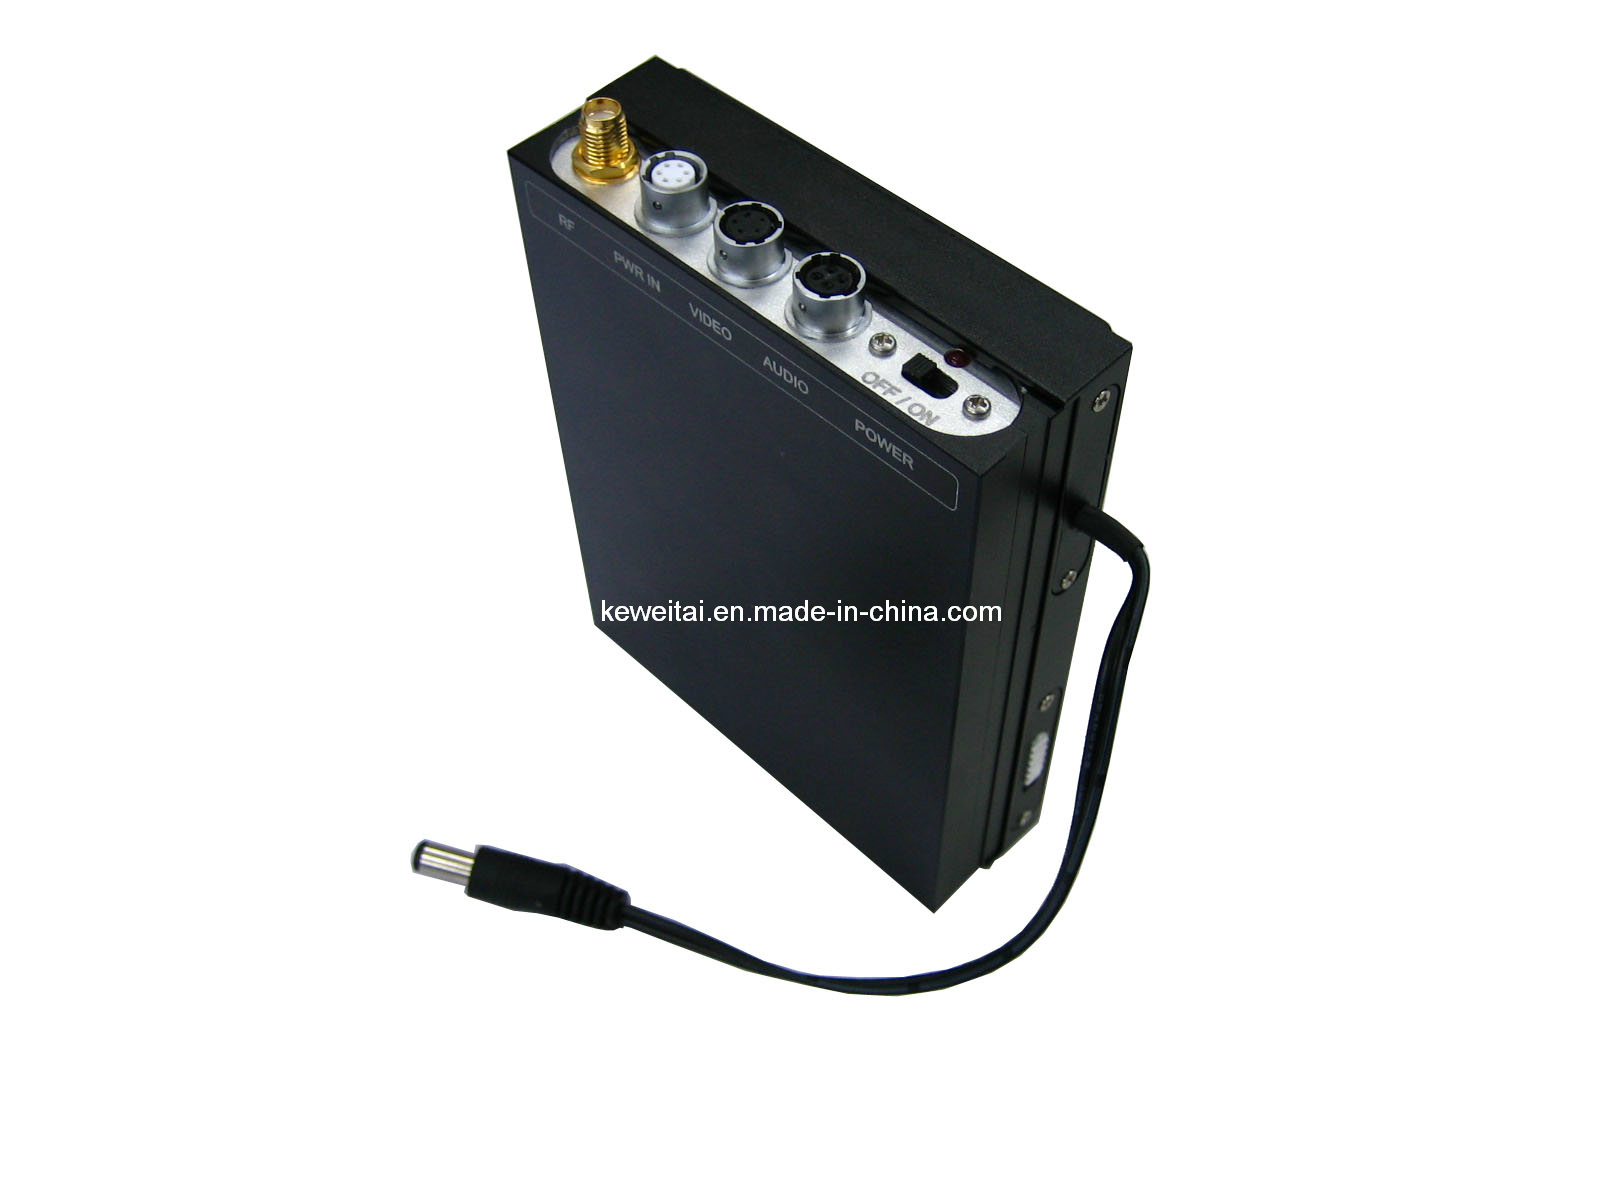 200MW-500MW Mini-Type Video Transmitter